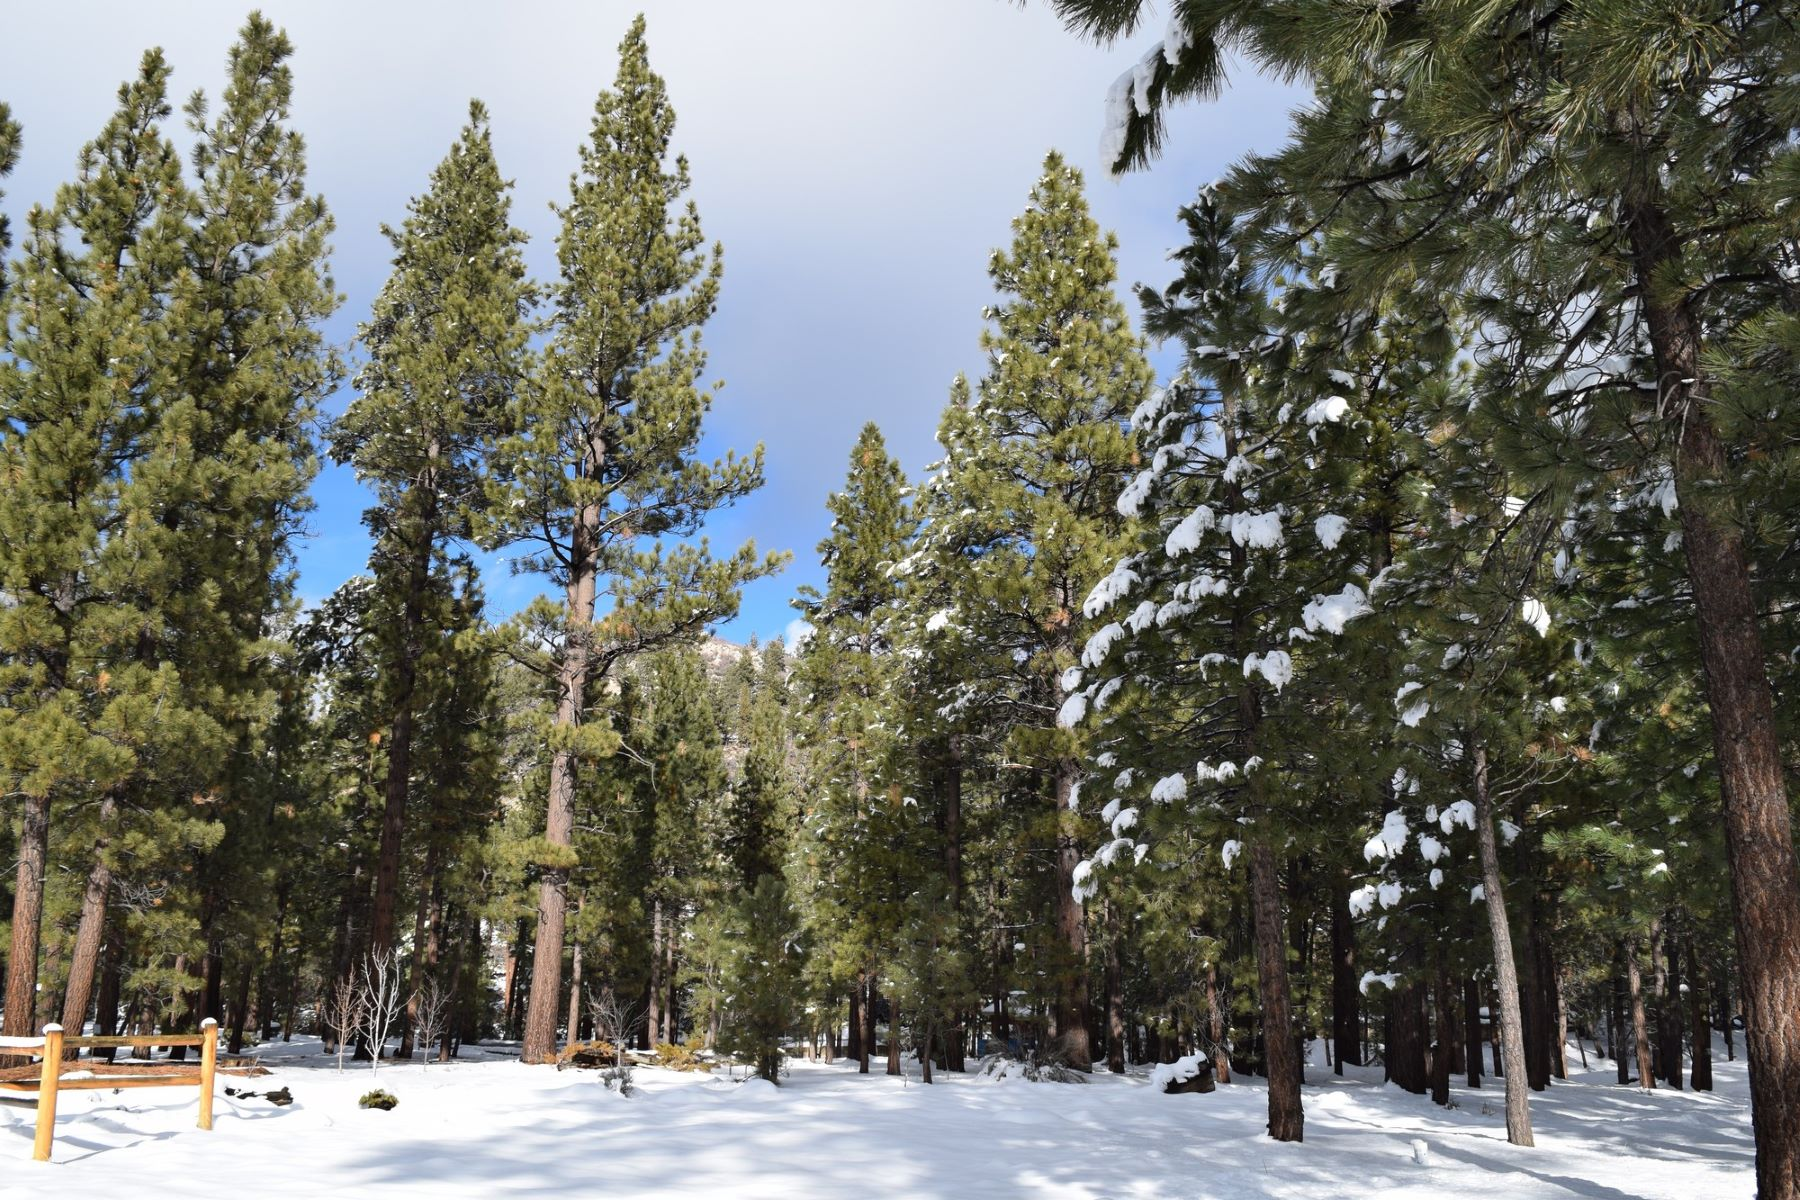 Terreno per Vendita alle ore 131 N. Starvation Flats Big Bear Lake, California, 92315 Stati Uniti